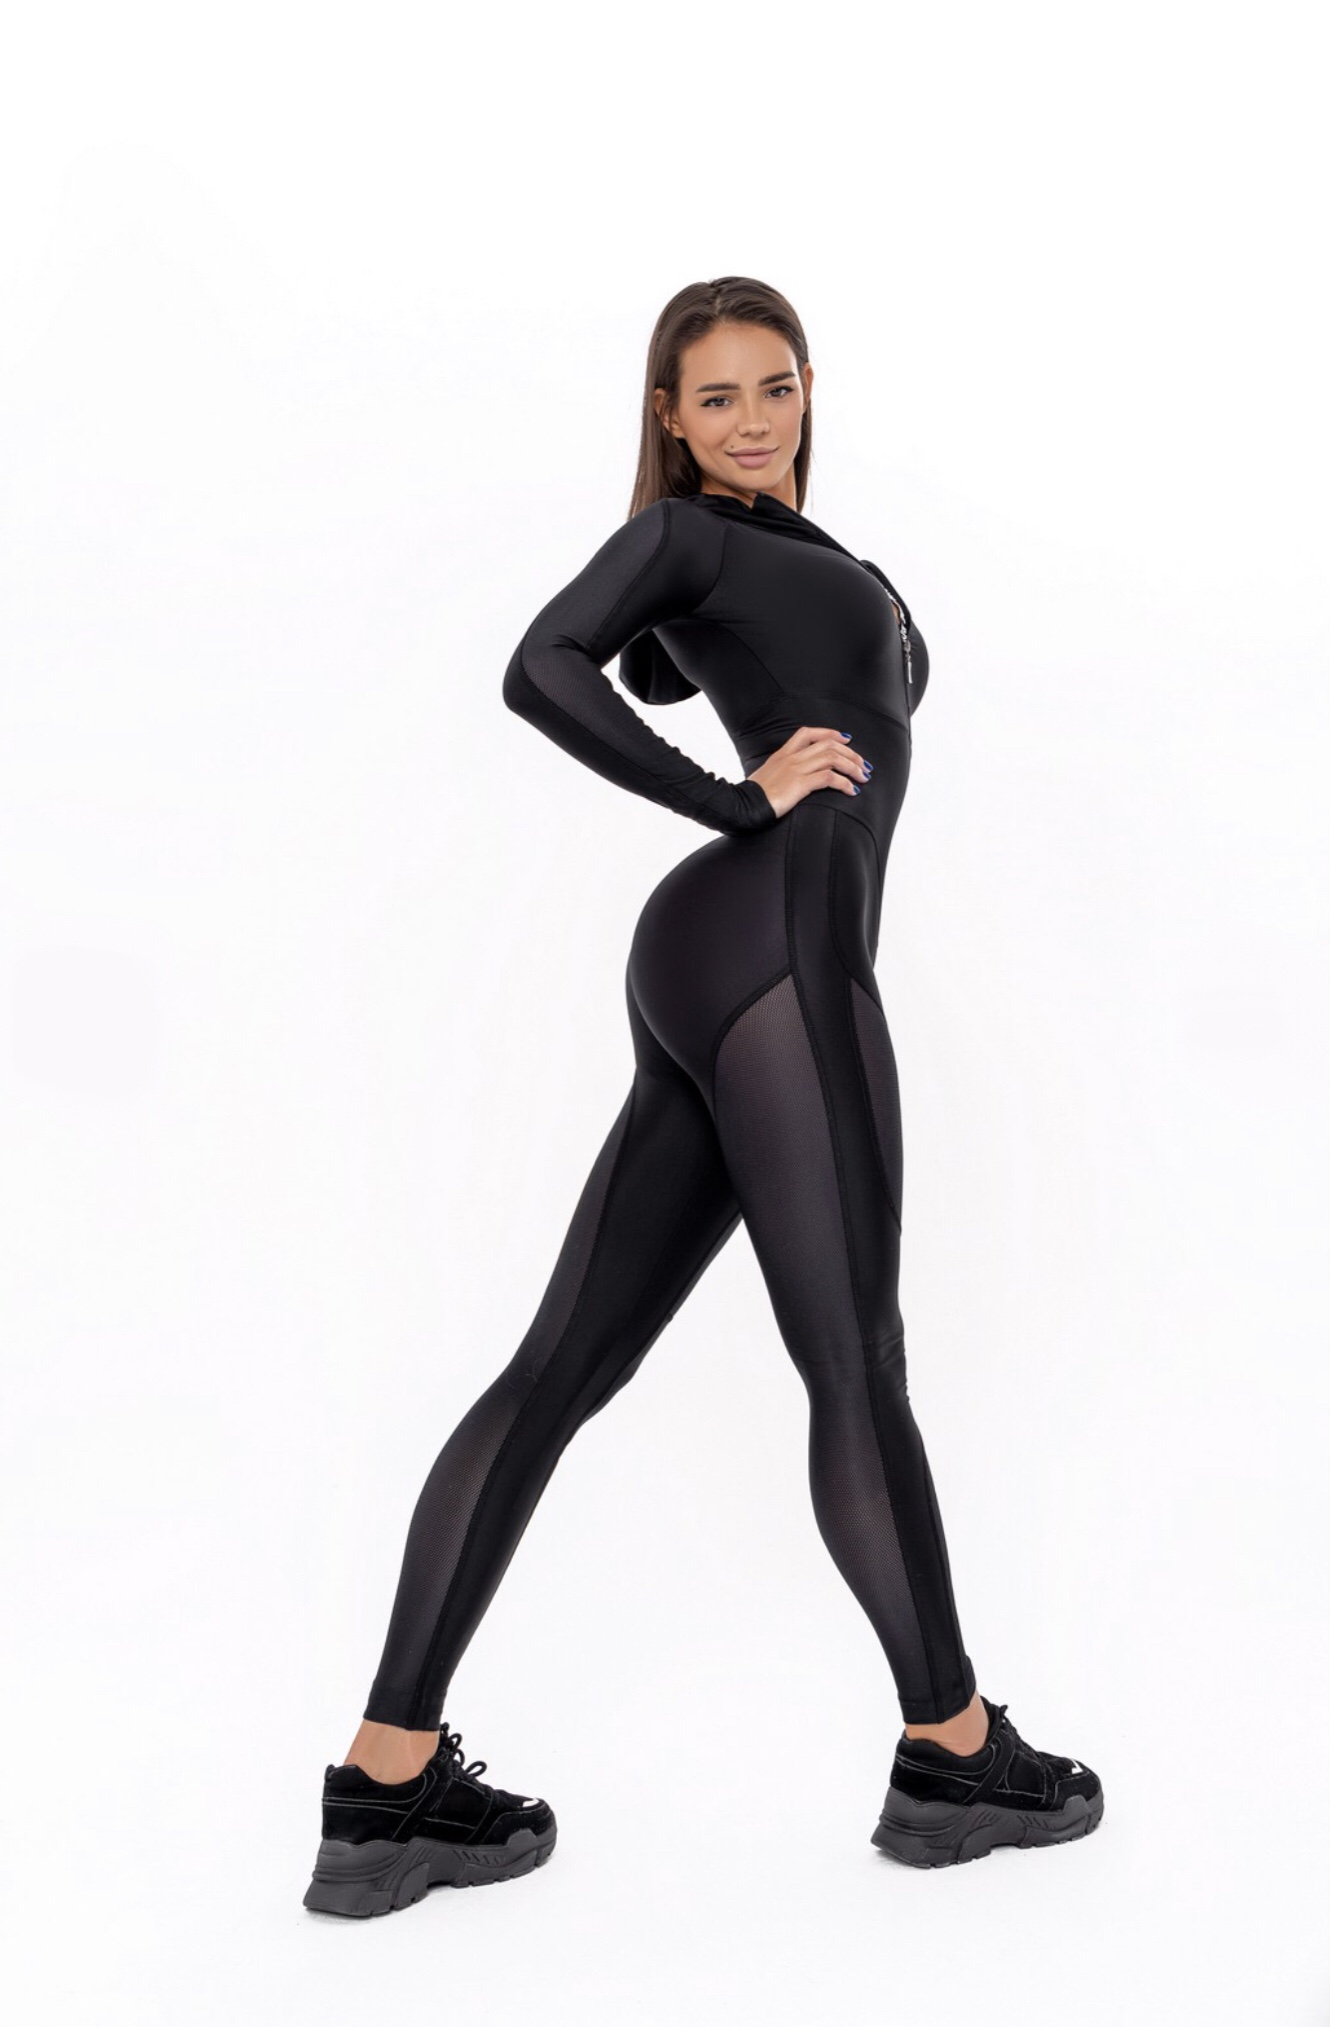 Bona Fide Oy - Vsyo Gym Suit